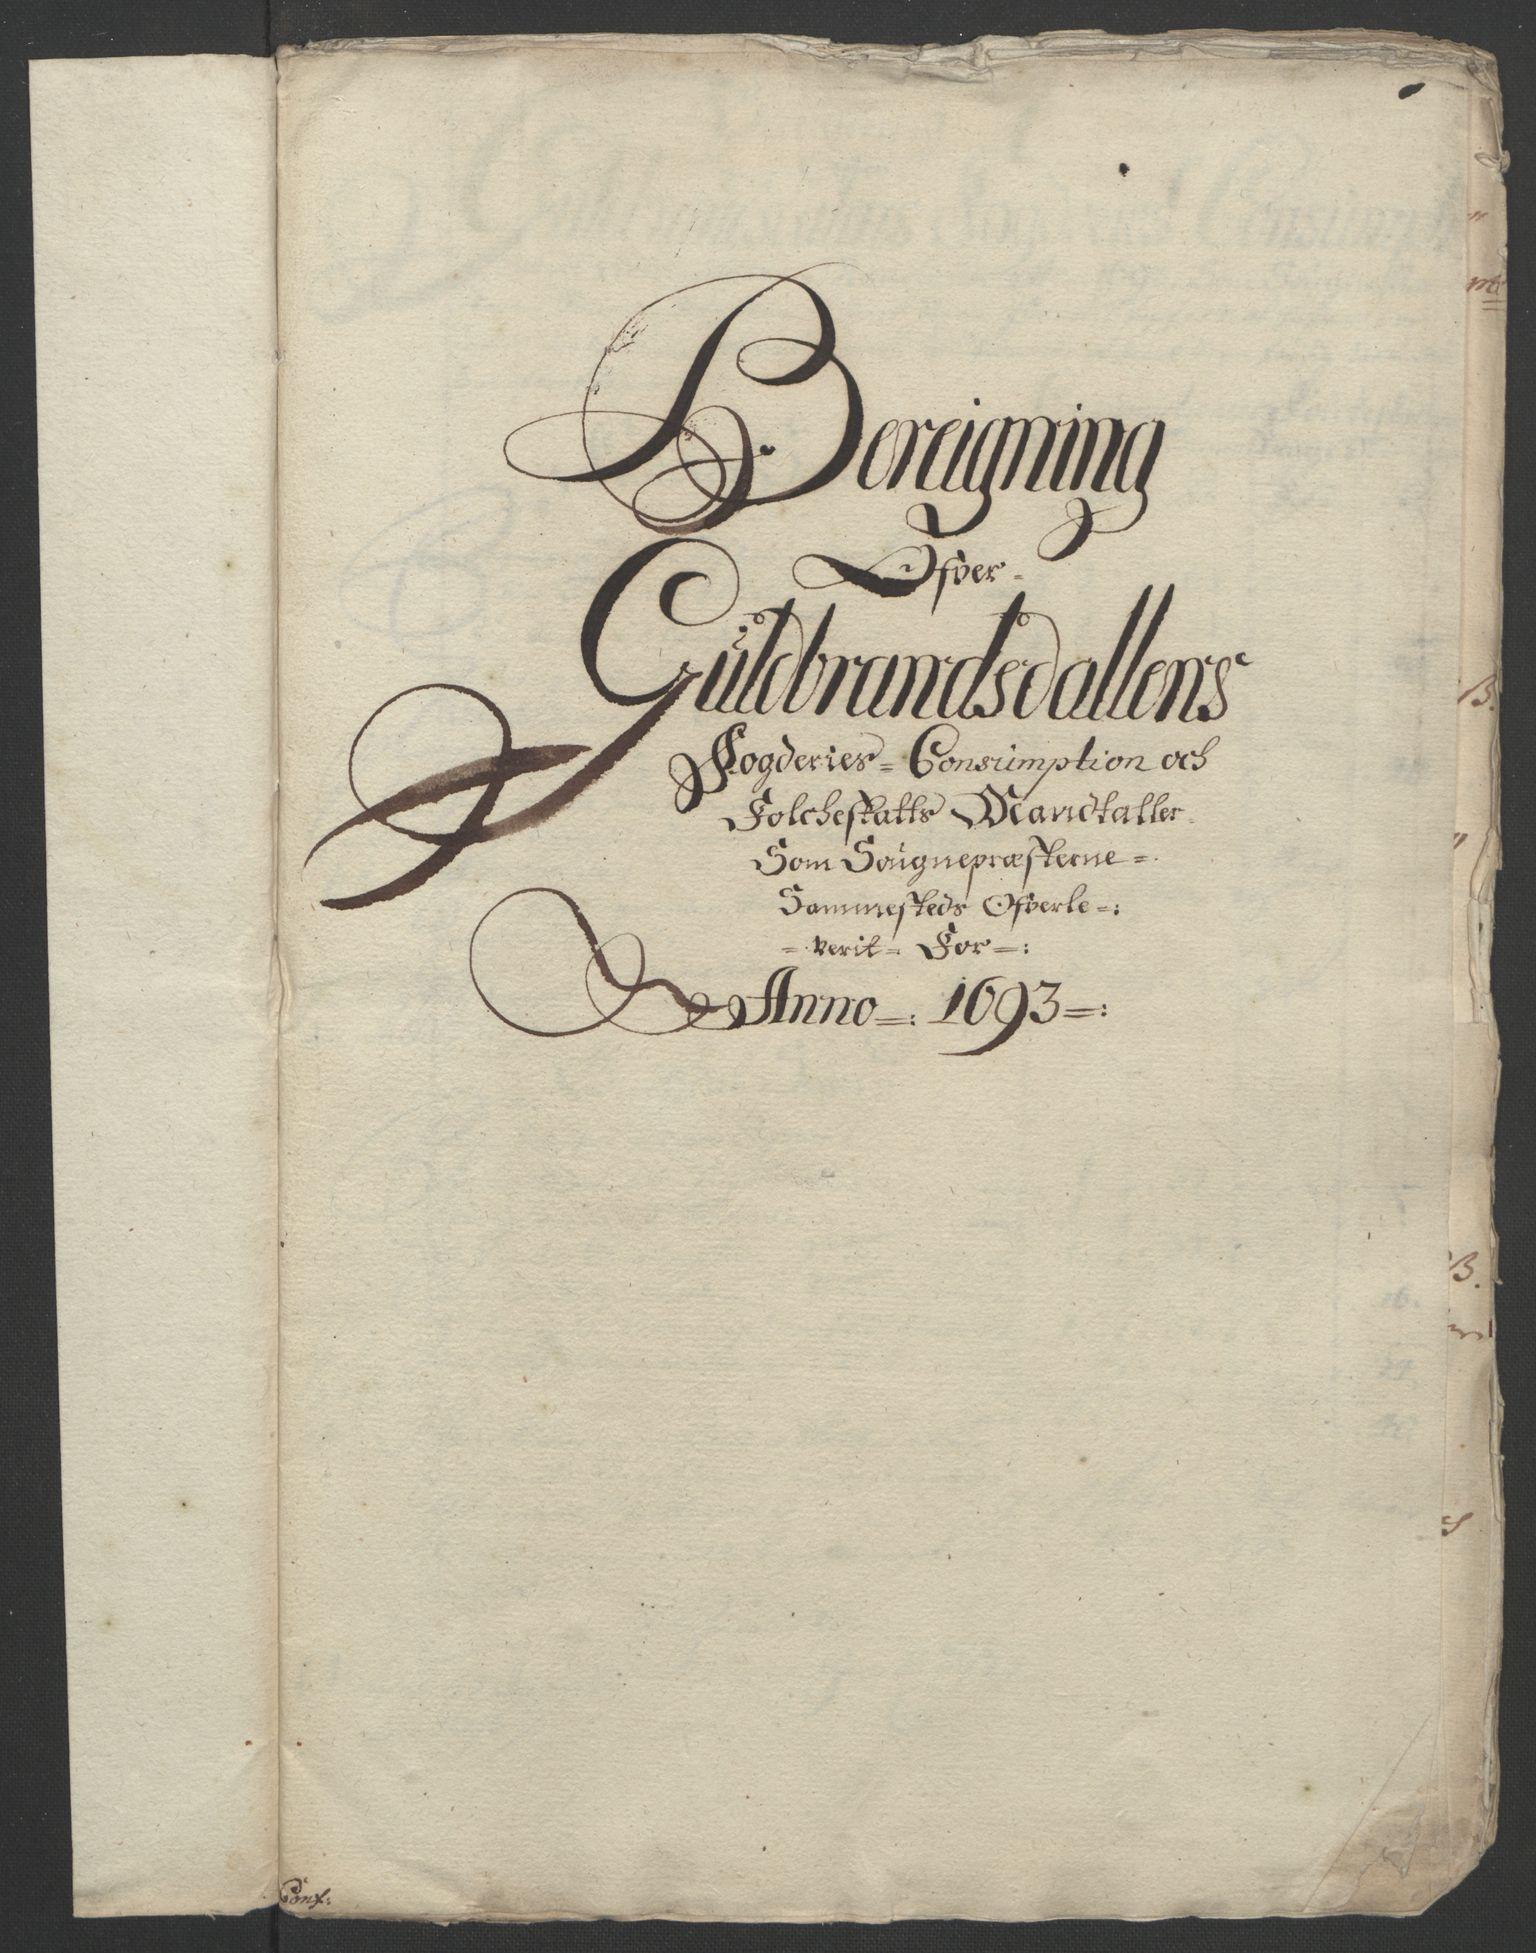 RA, Rentekammeret inntil 1814, Reviderte regnskaper, Fogderegnskap, R17/L1167: Fogderegnskap Gudbrandsdal, 1693, s. 319